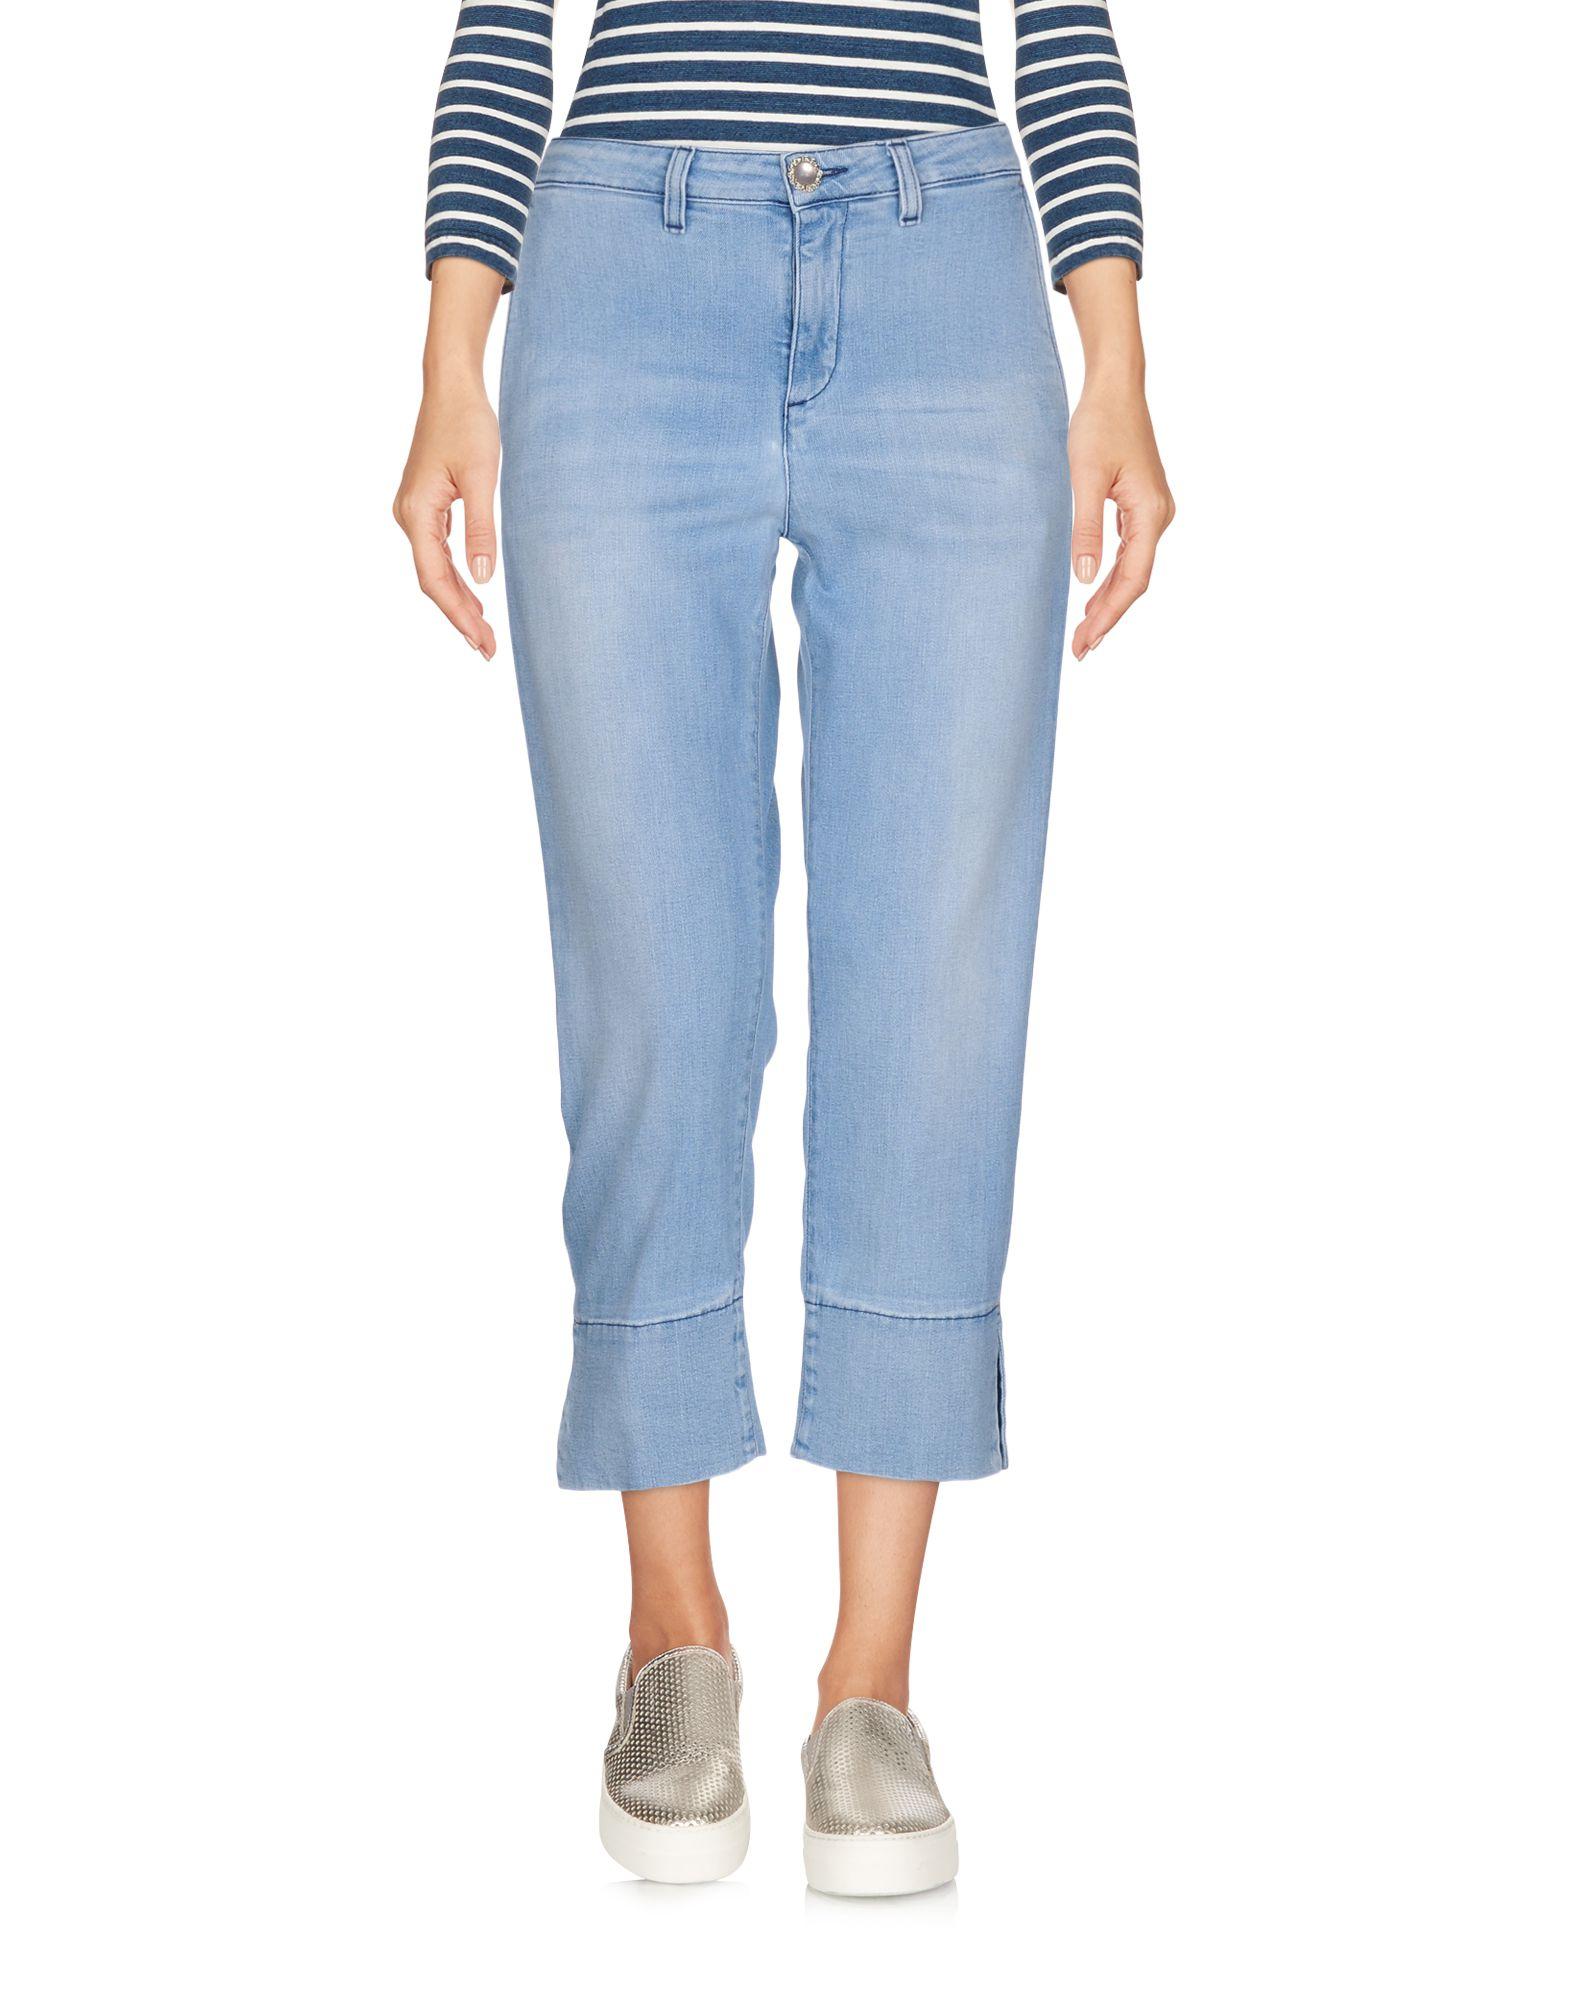 JIJIL LE BLEU Джинсовые брюки-капри каталог le bunny bleu